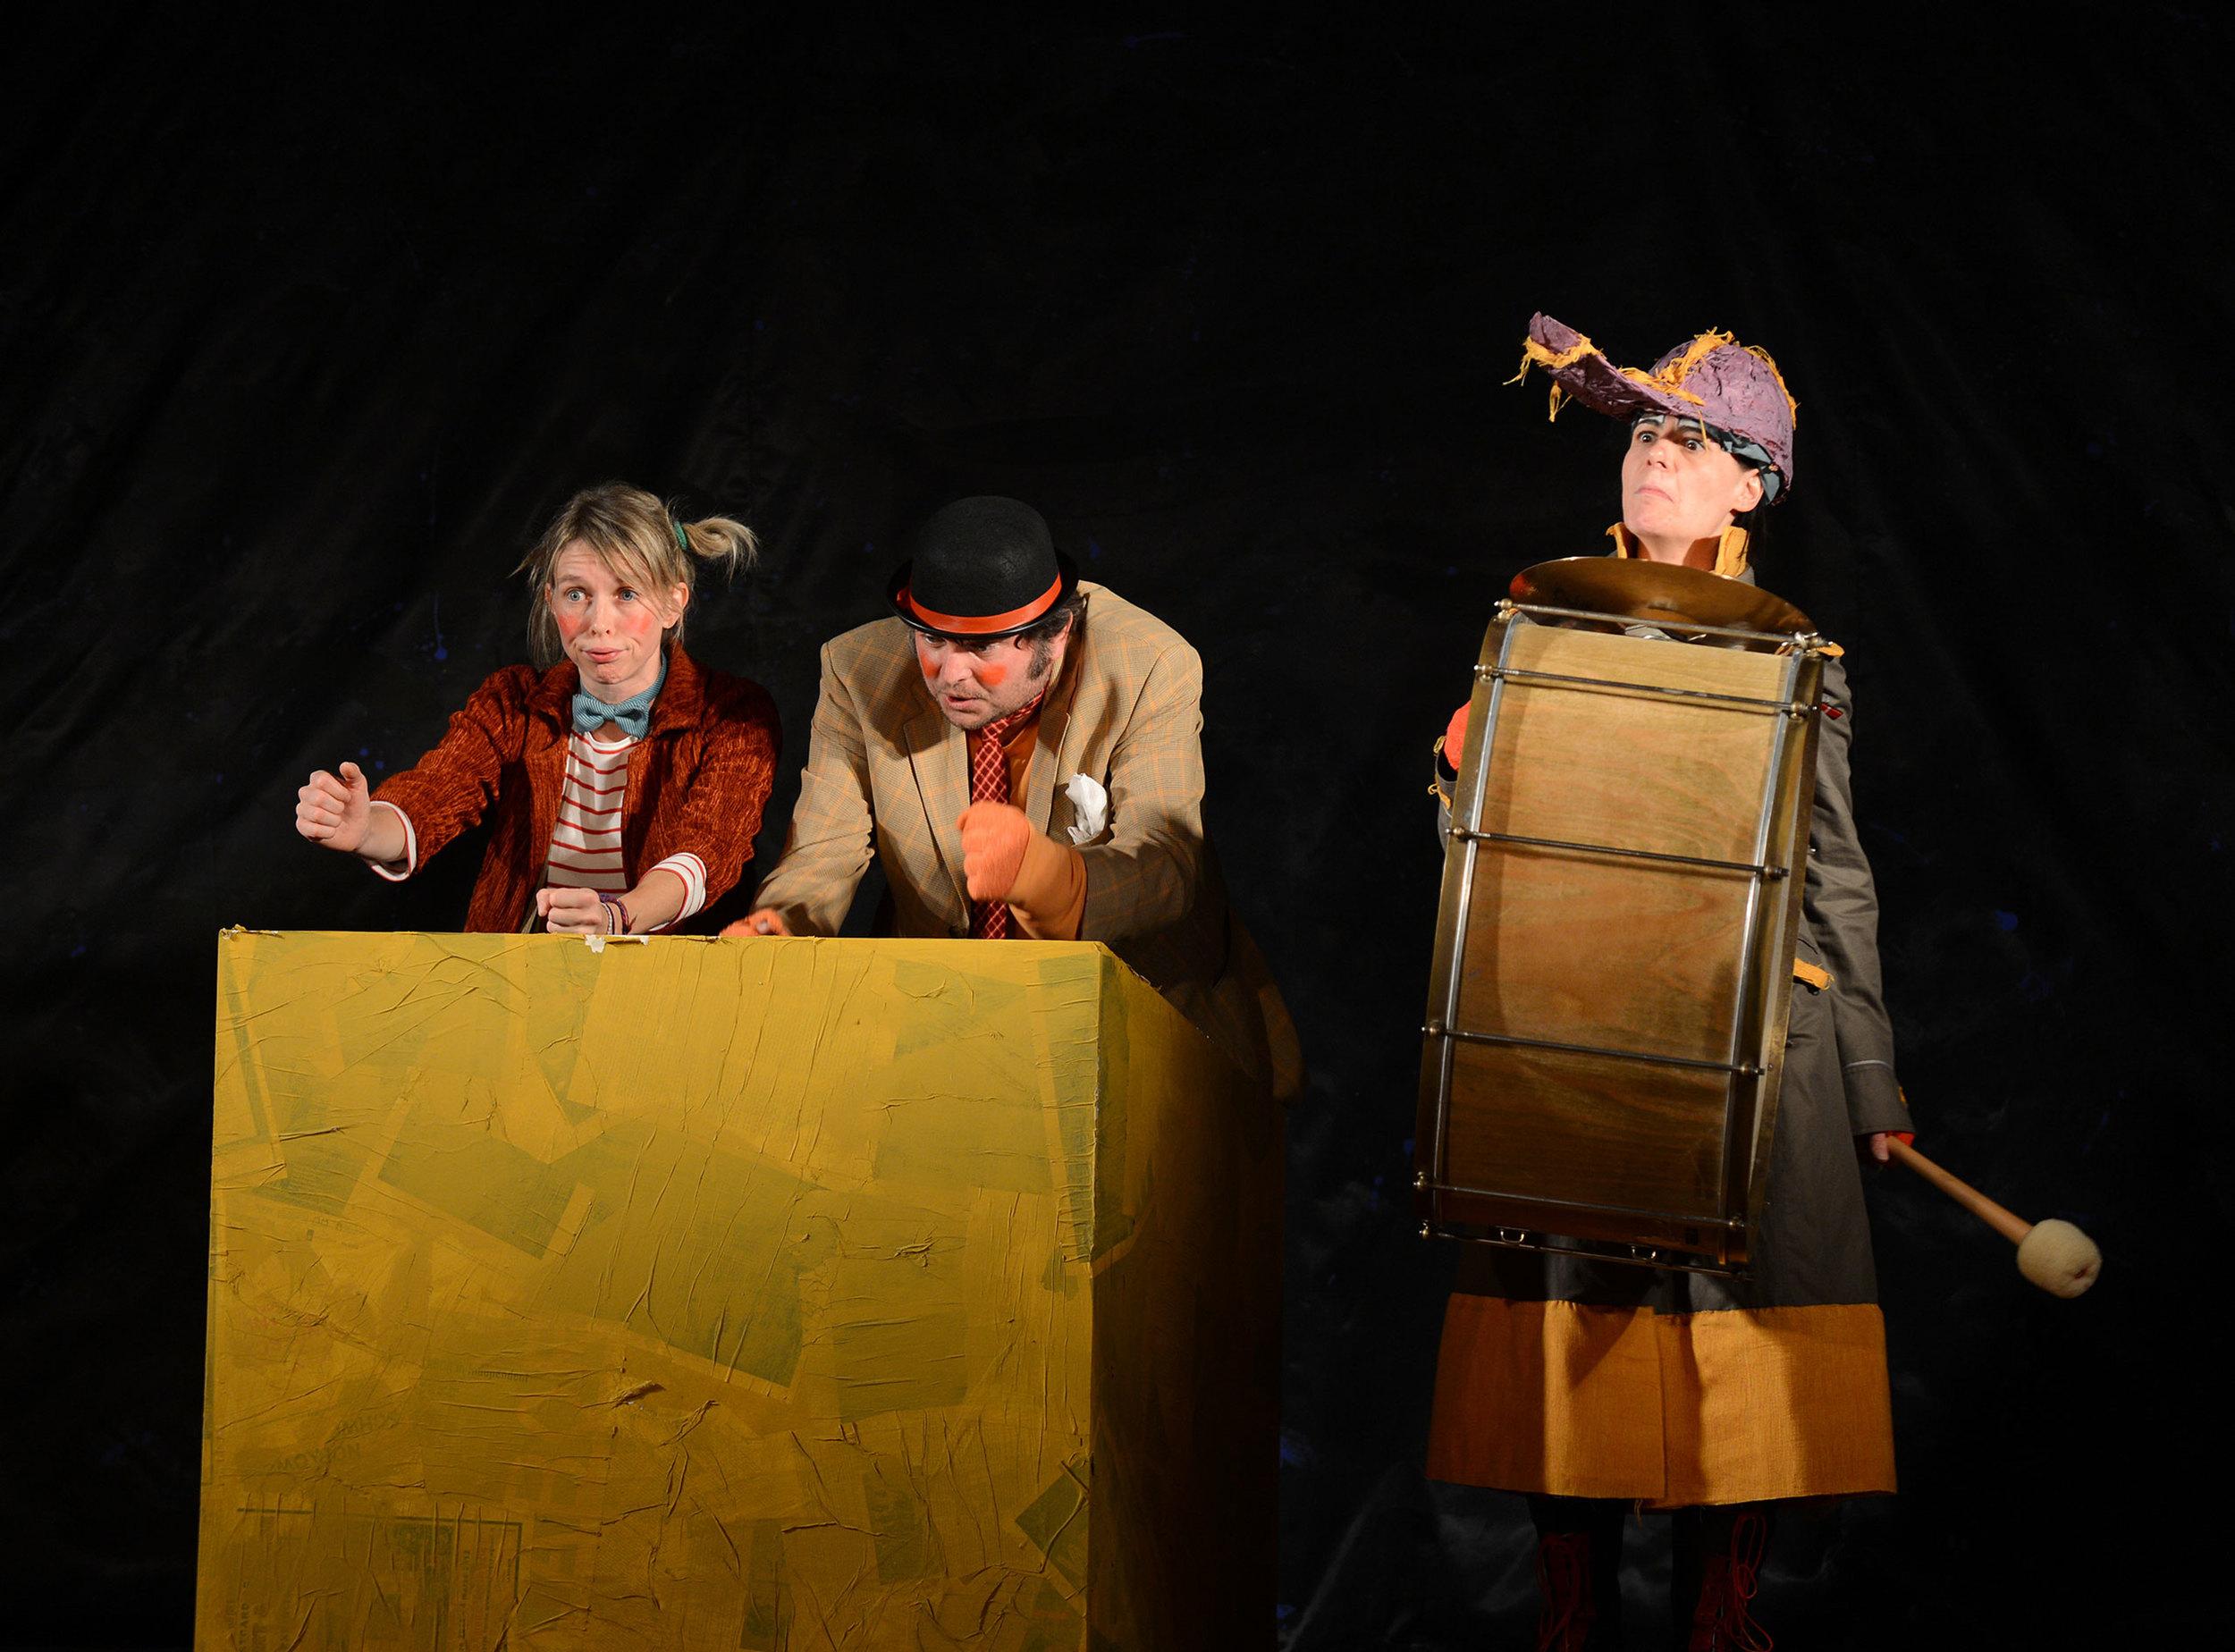 Frogura y Bartolomeus é dui de bugn compagns che n'ô nia plü se lascè ingianè dal soldà,...